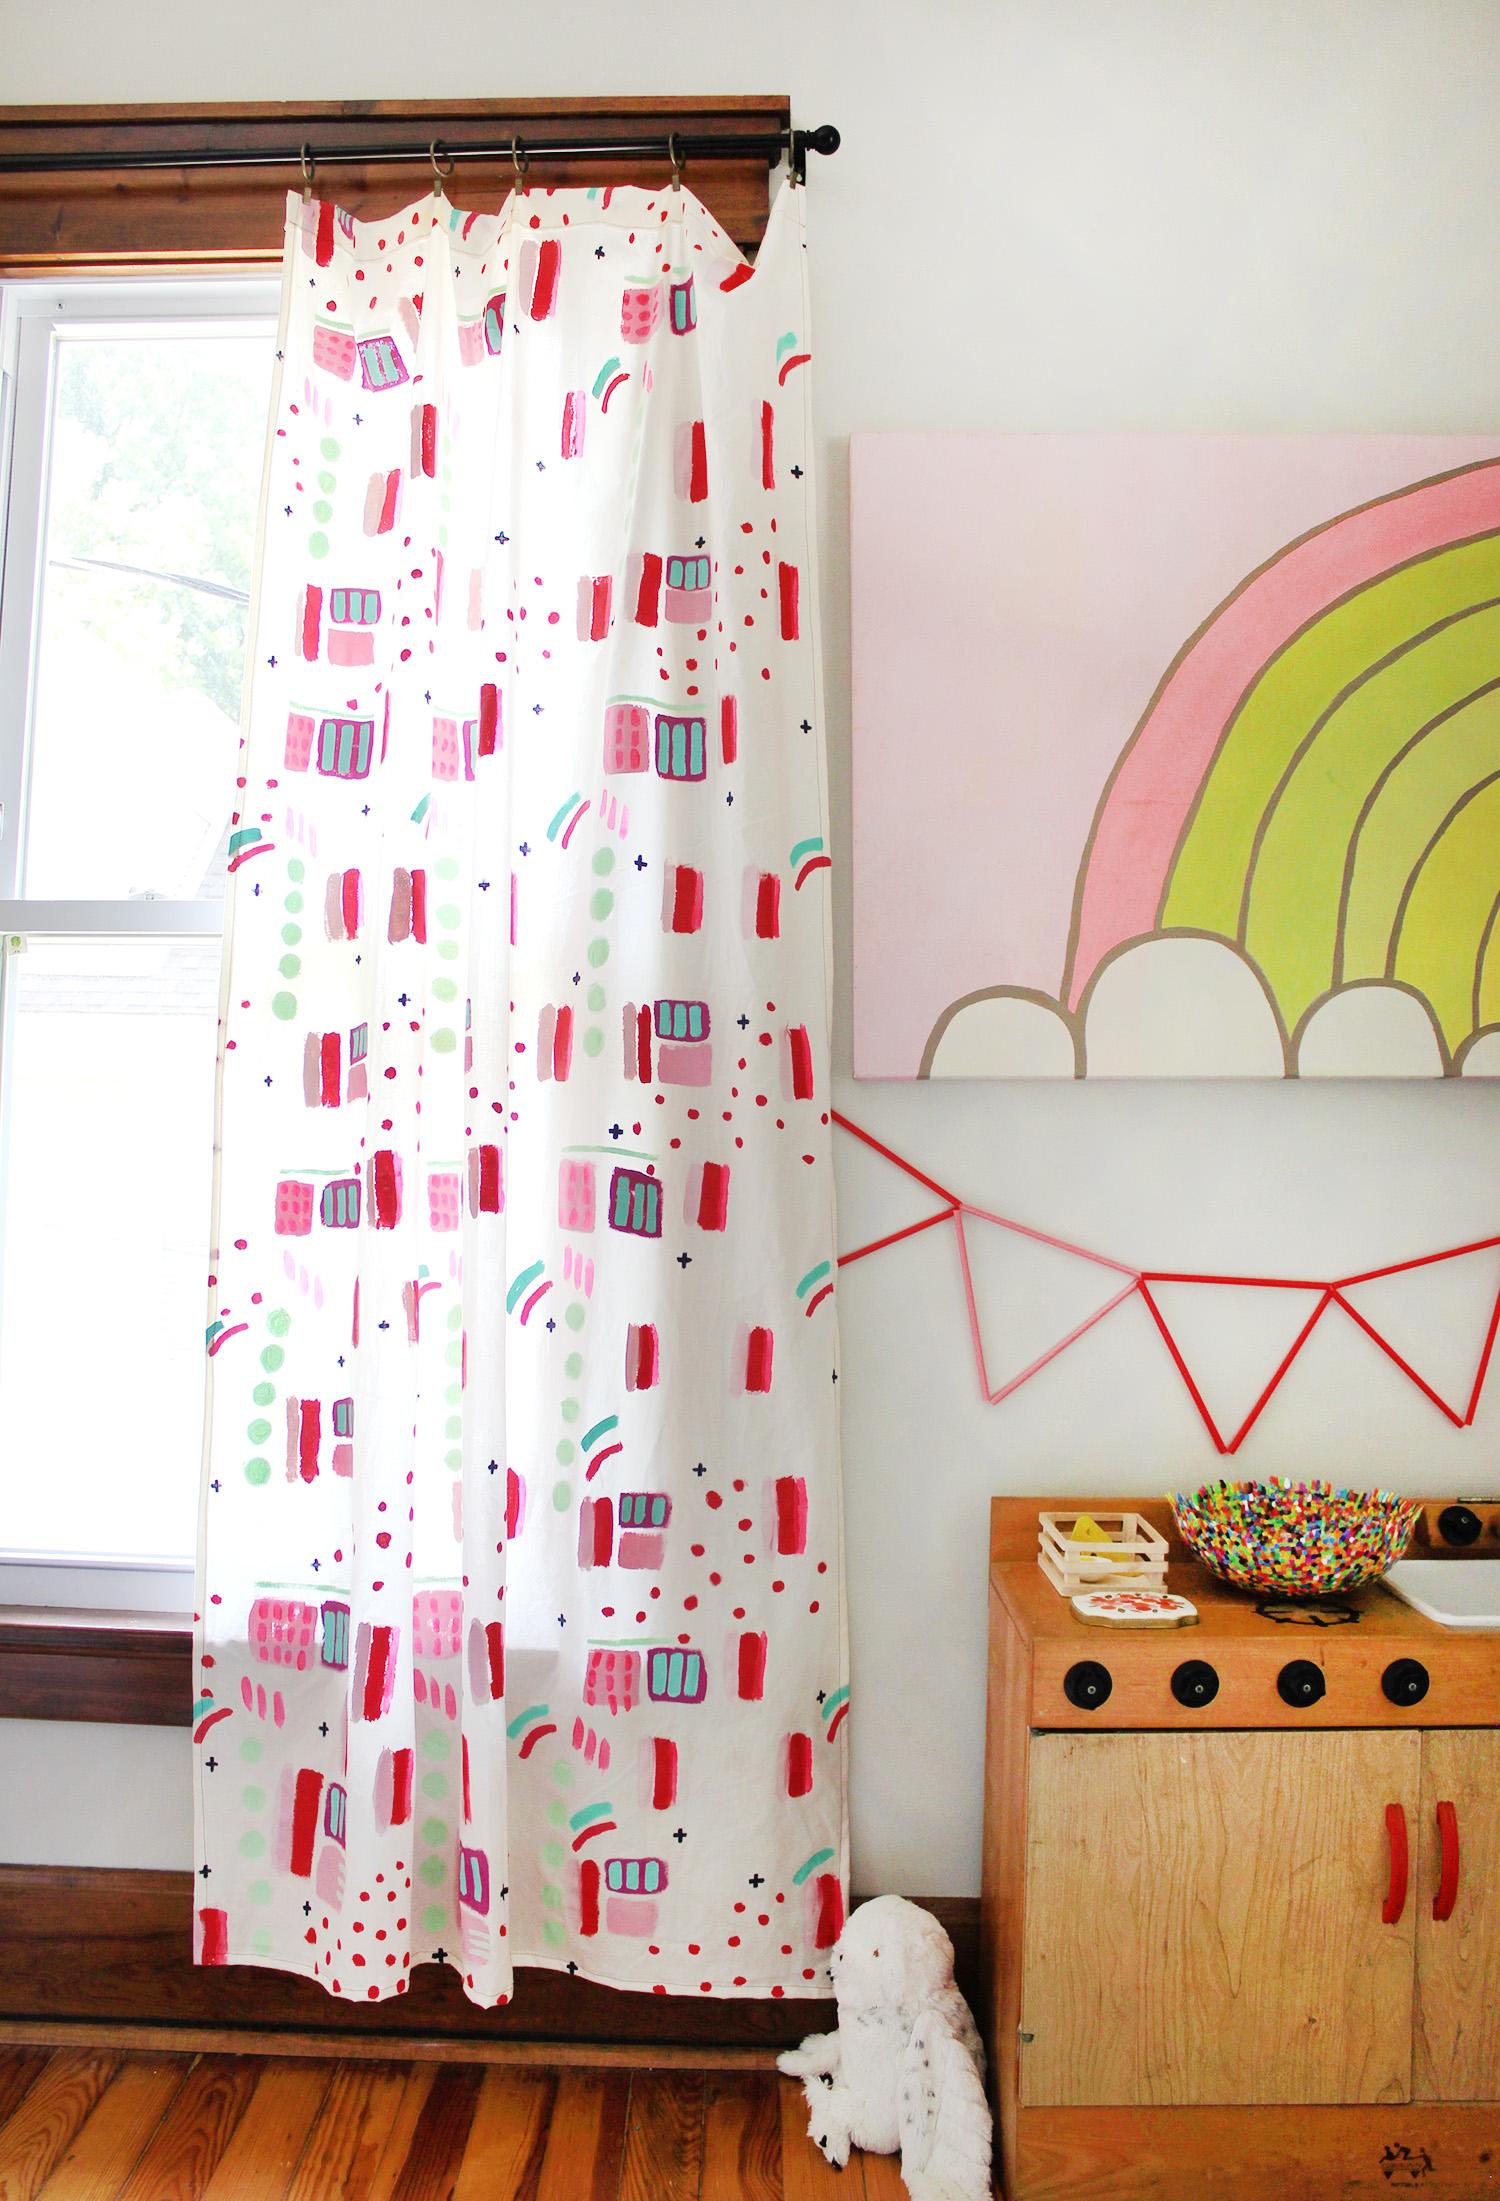 Abstract and Fun Curtain Panel DIY